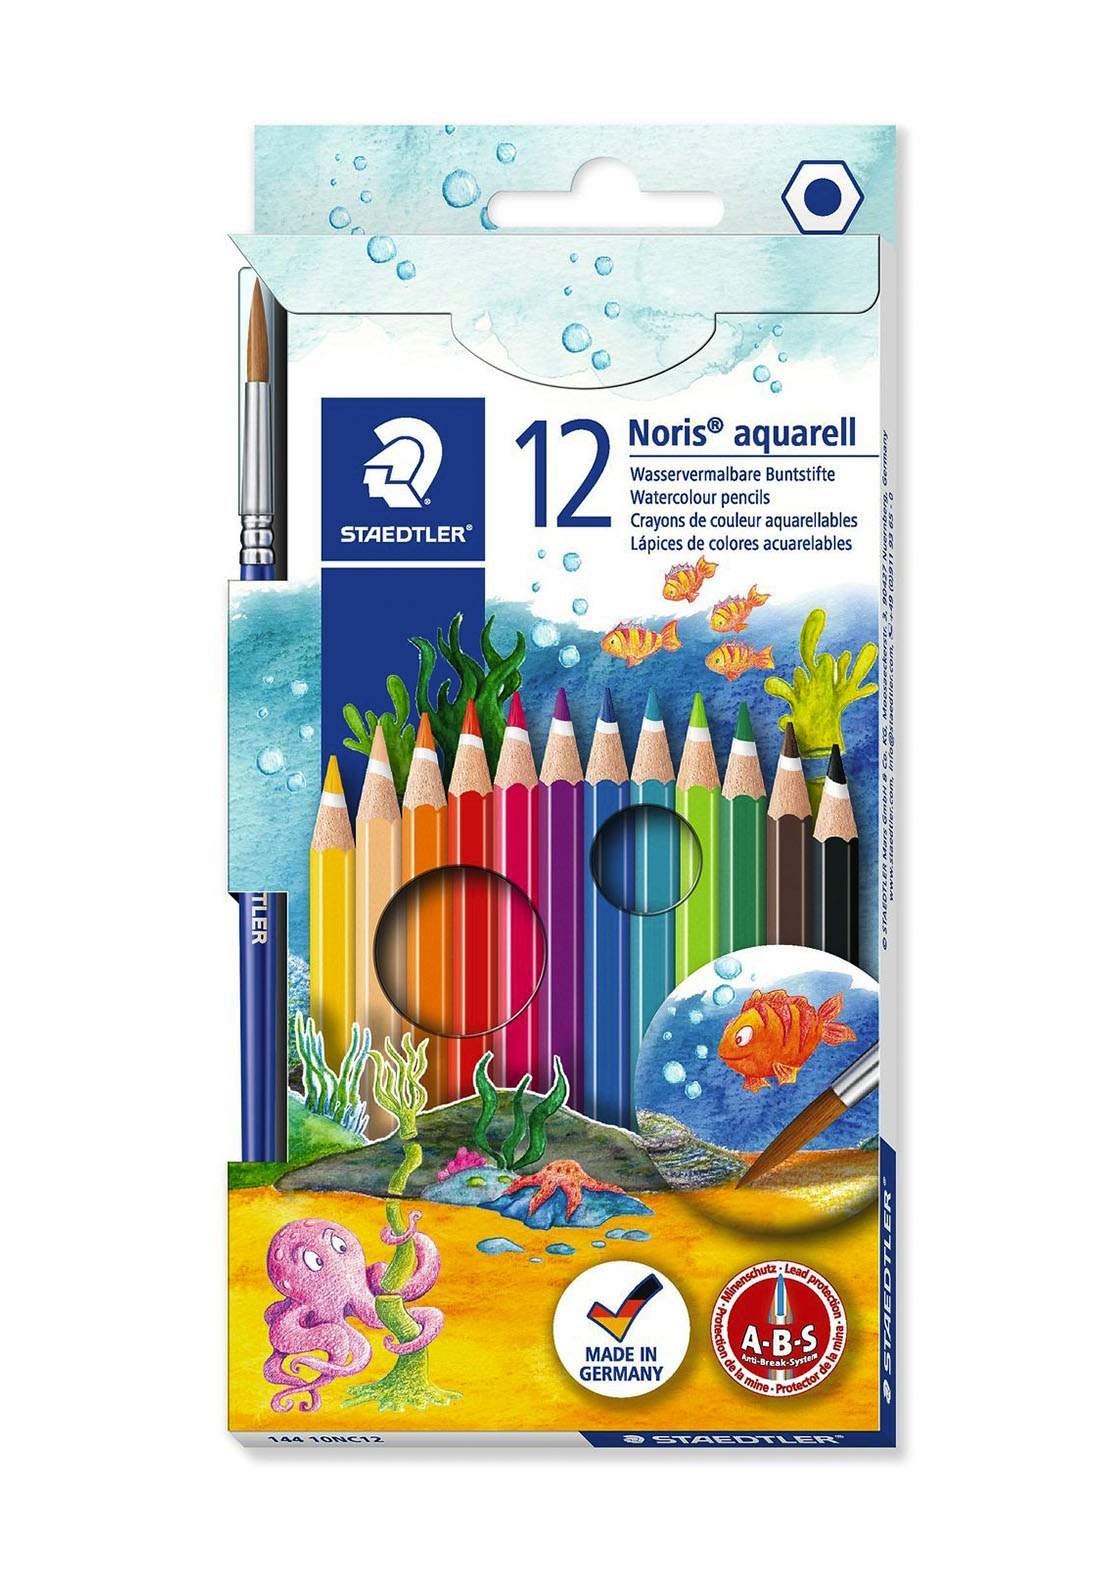 Staedtler 144 10NC12 - 12Pcs أقلام تلوين مائية + فرشاة